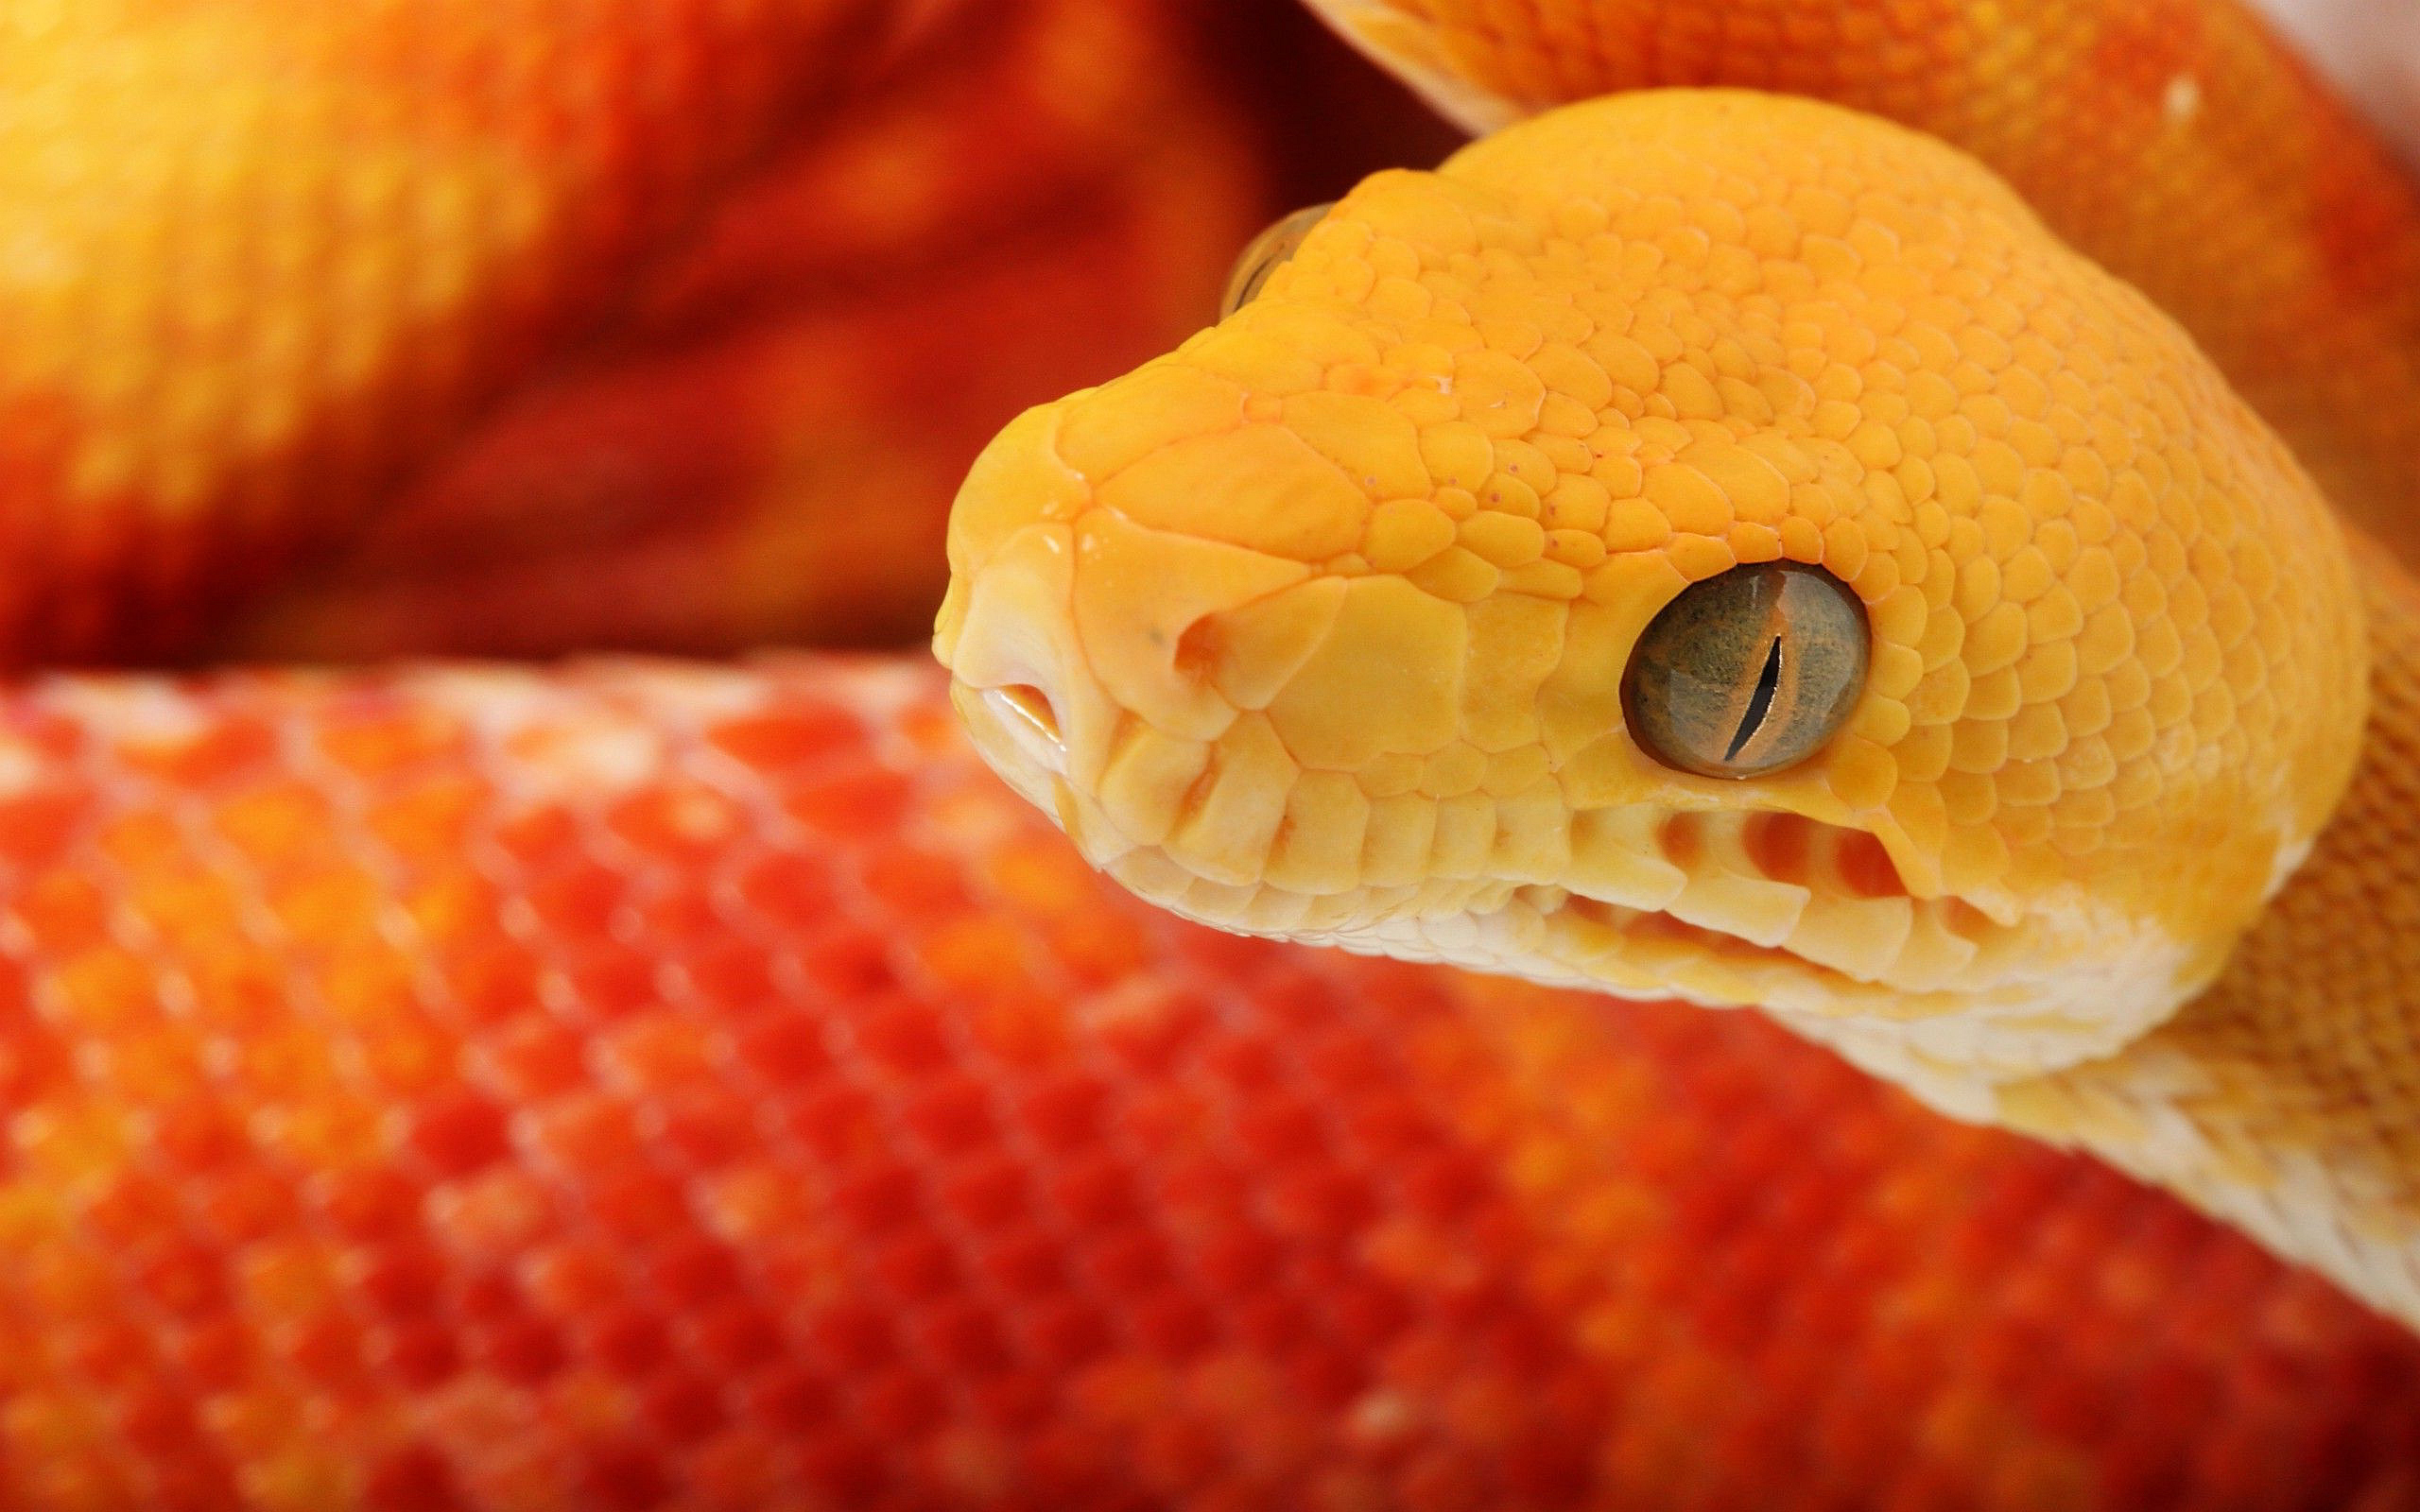 snake orange picutres